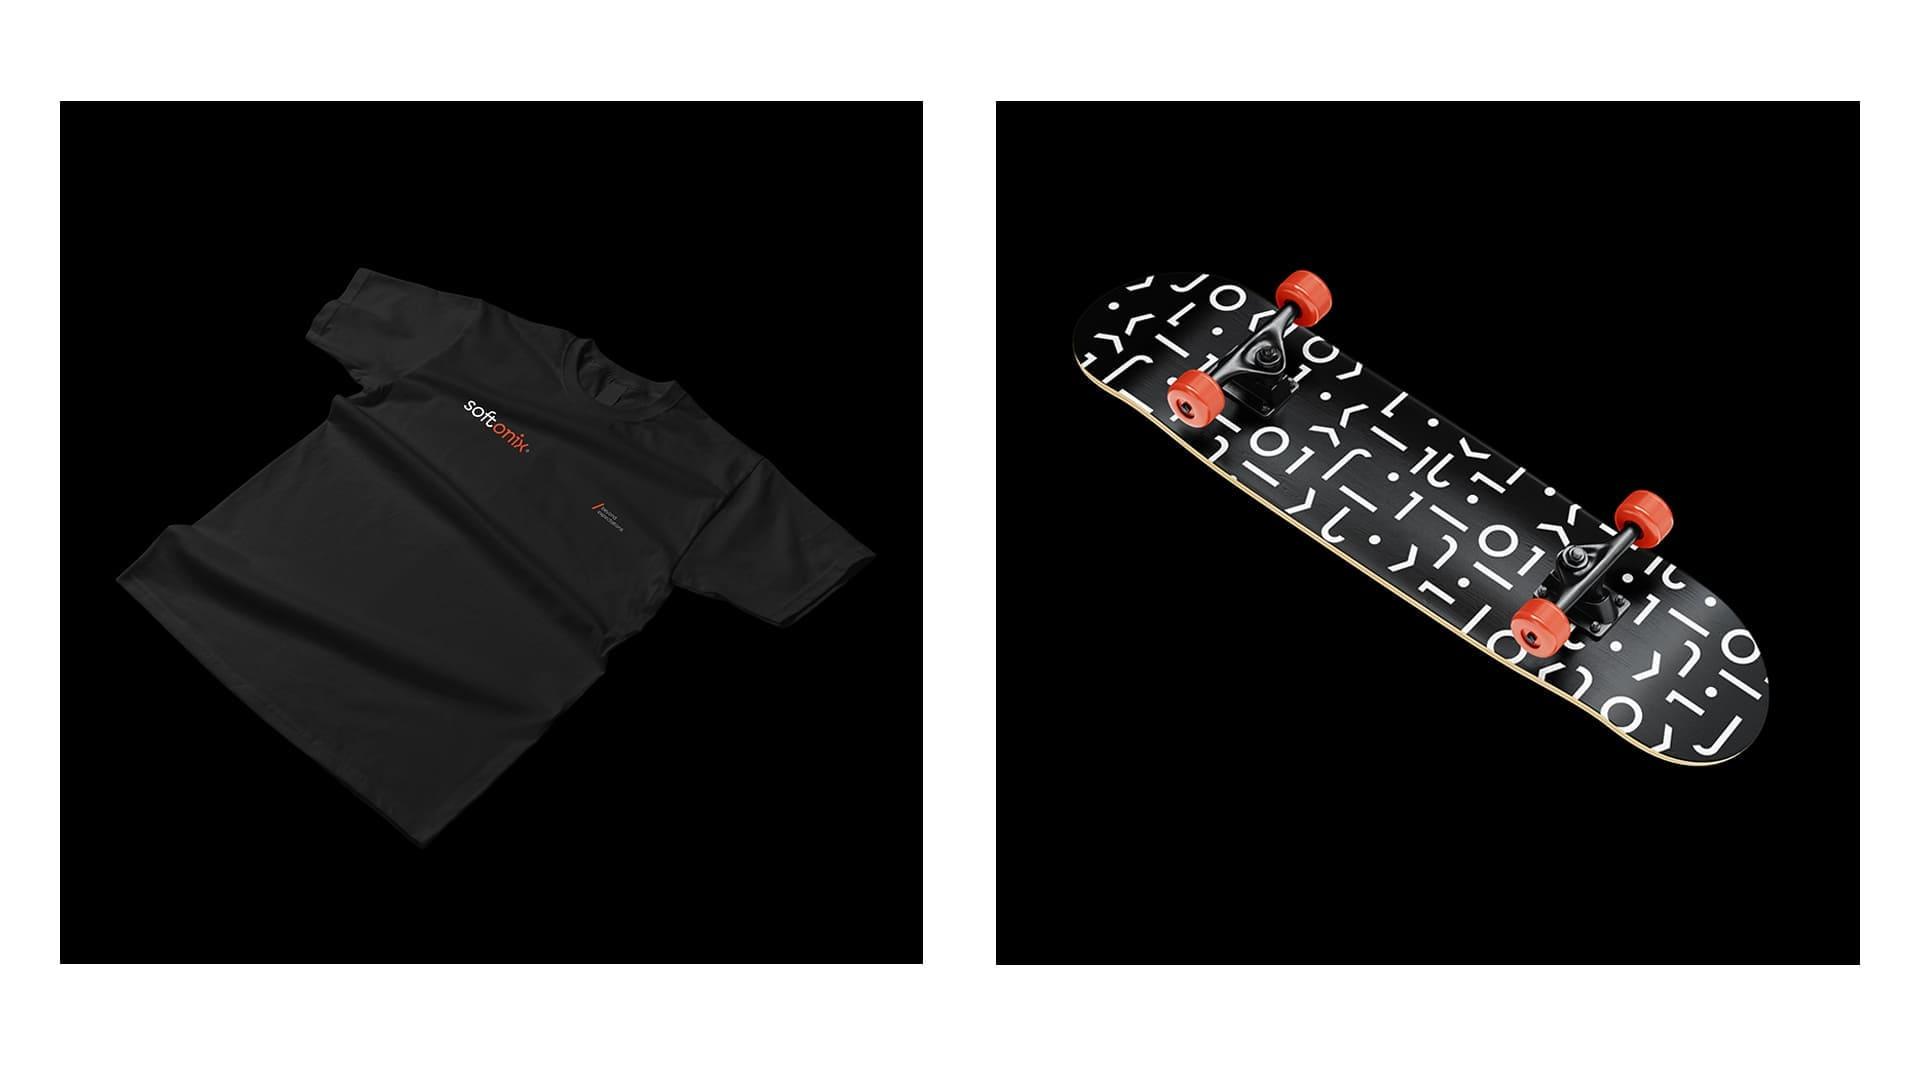 gra brand design softonix 19